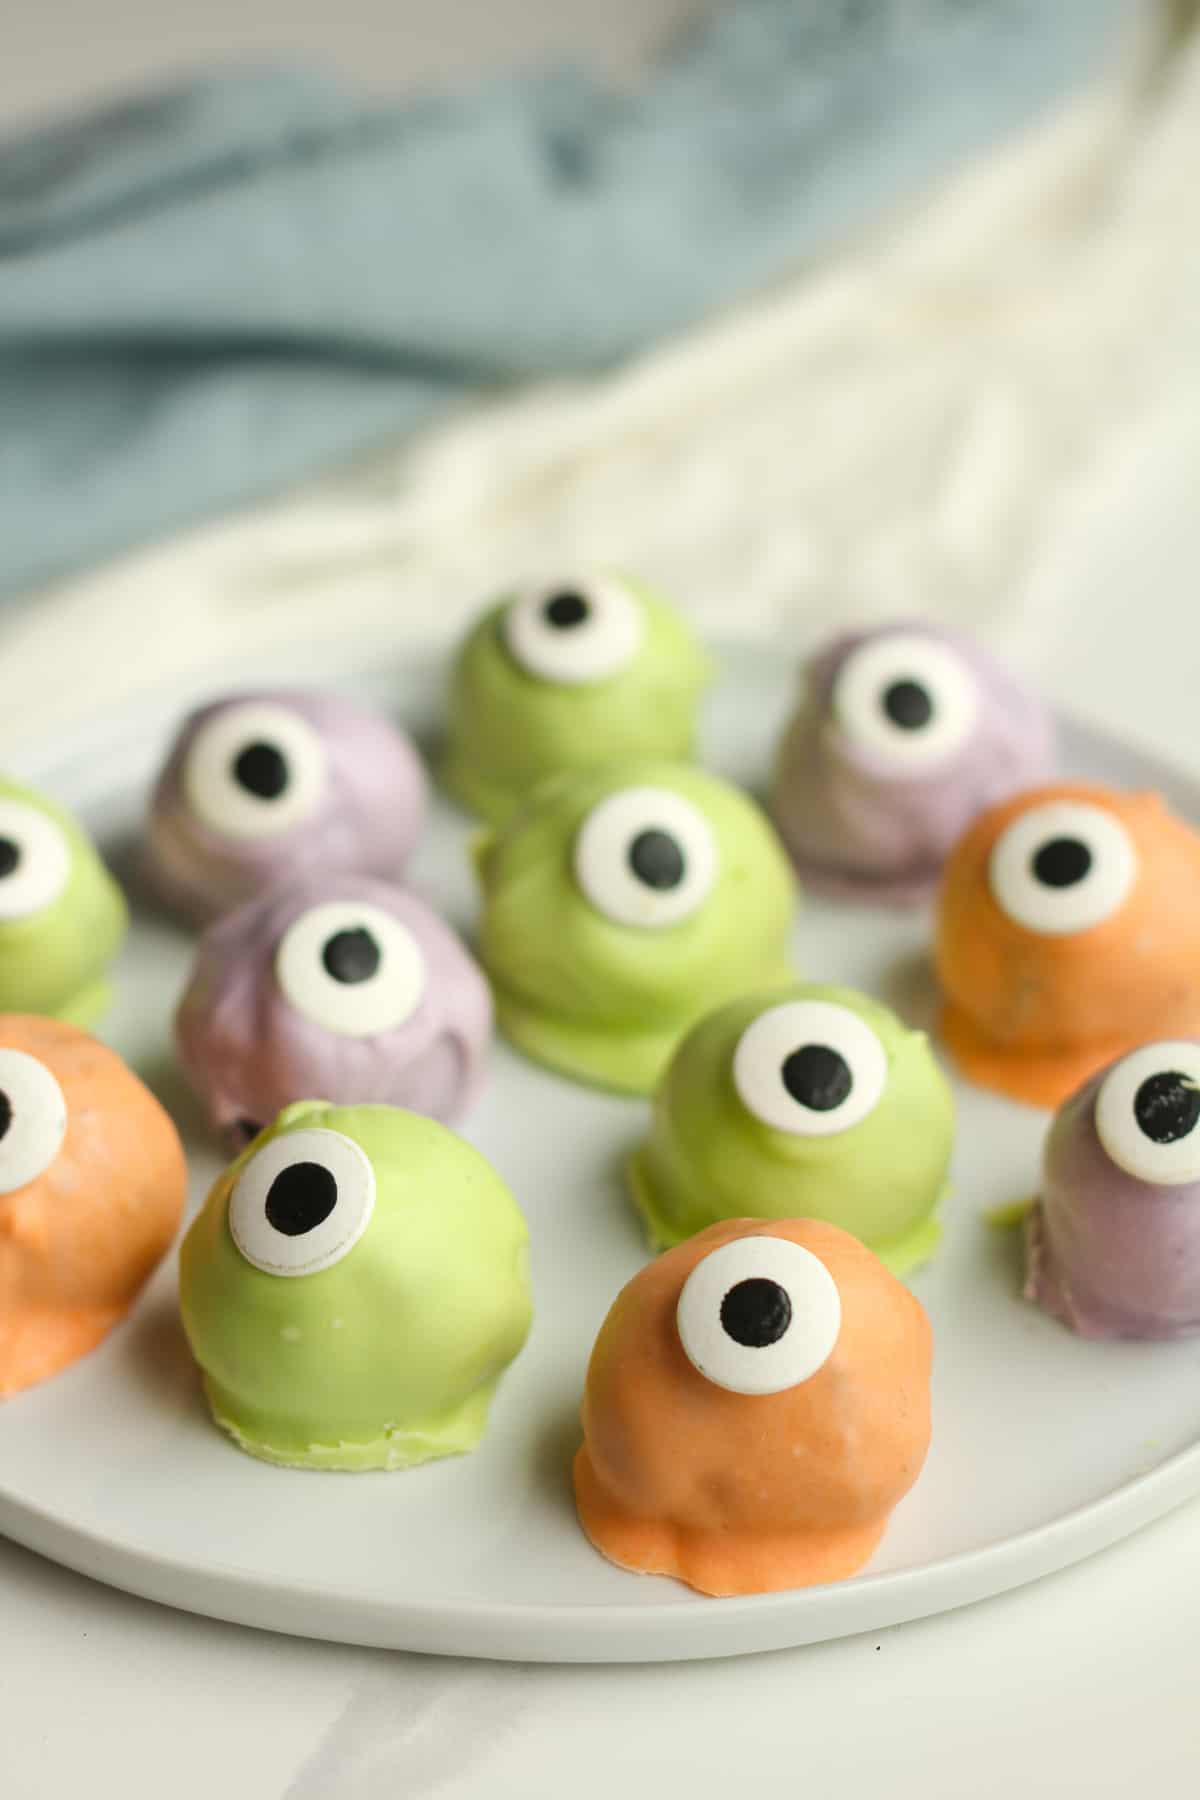 Side shot of Oreo cookie eyeballs.